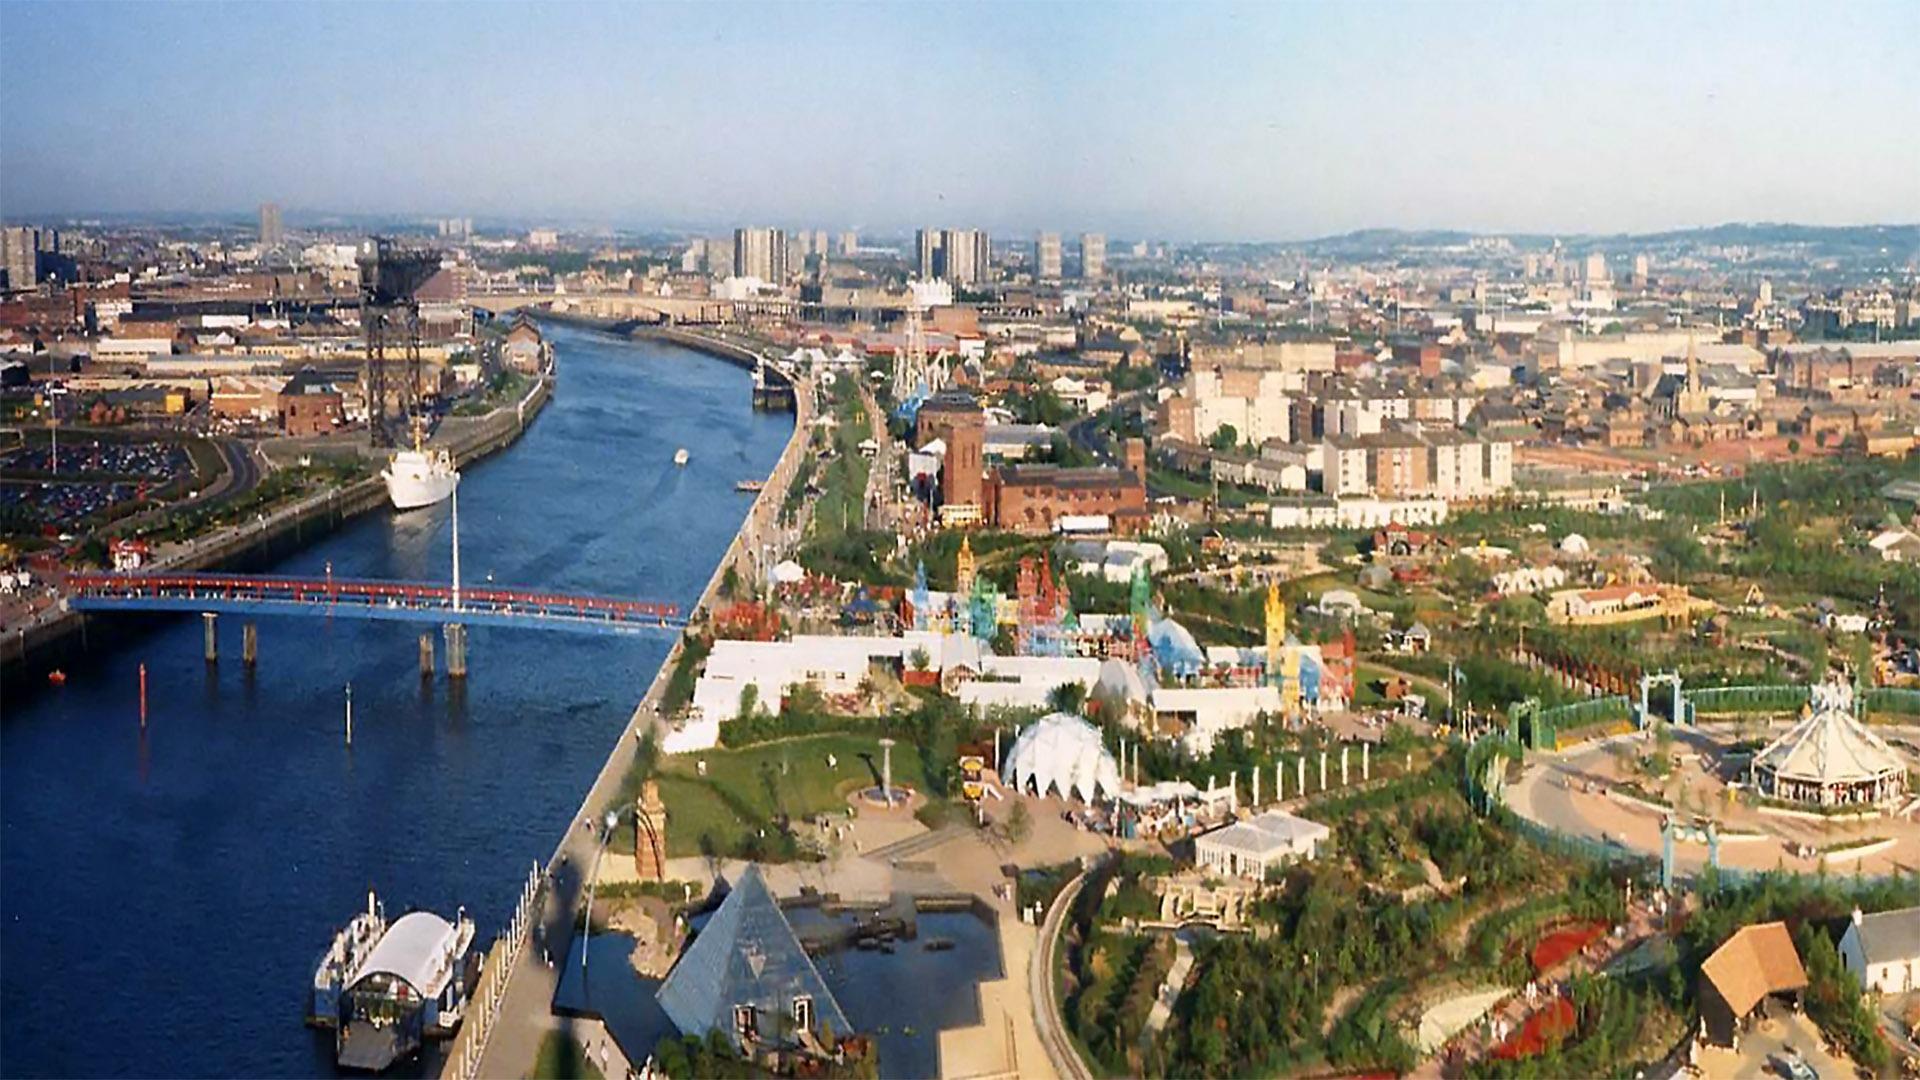 skyline view of england city